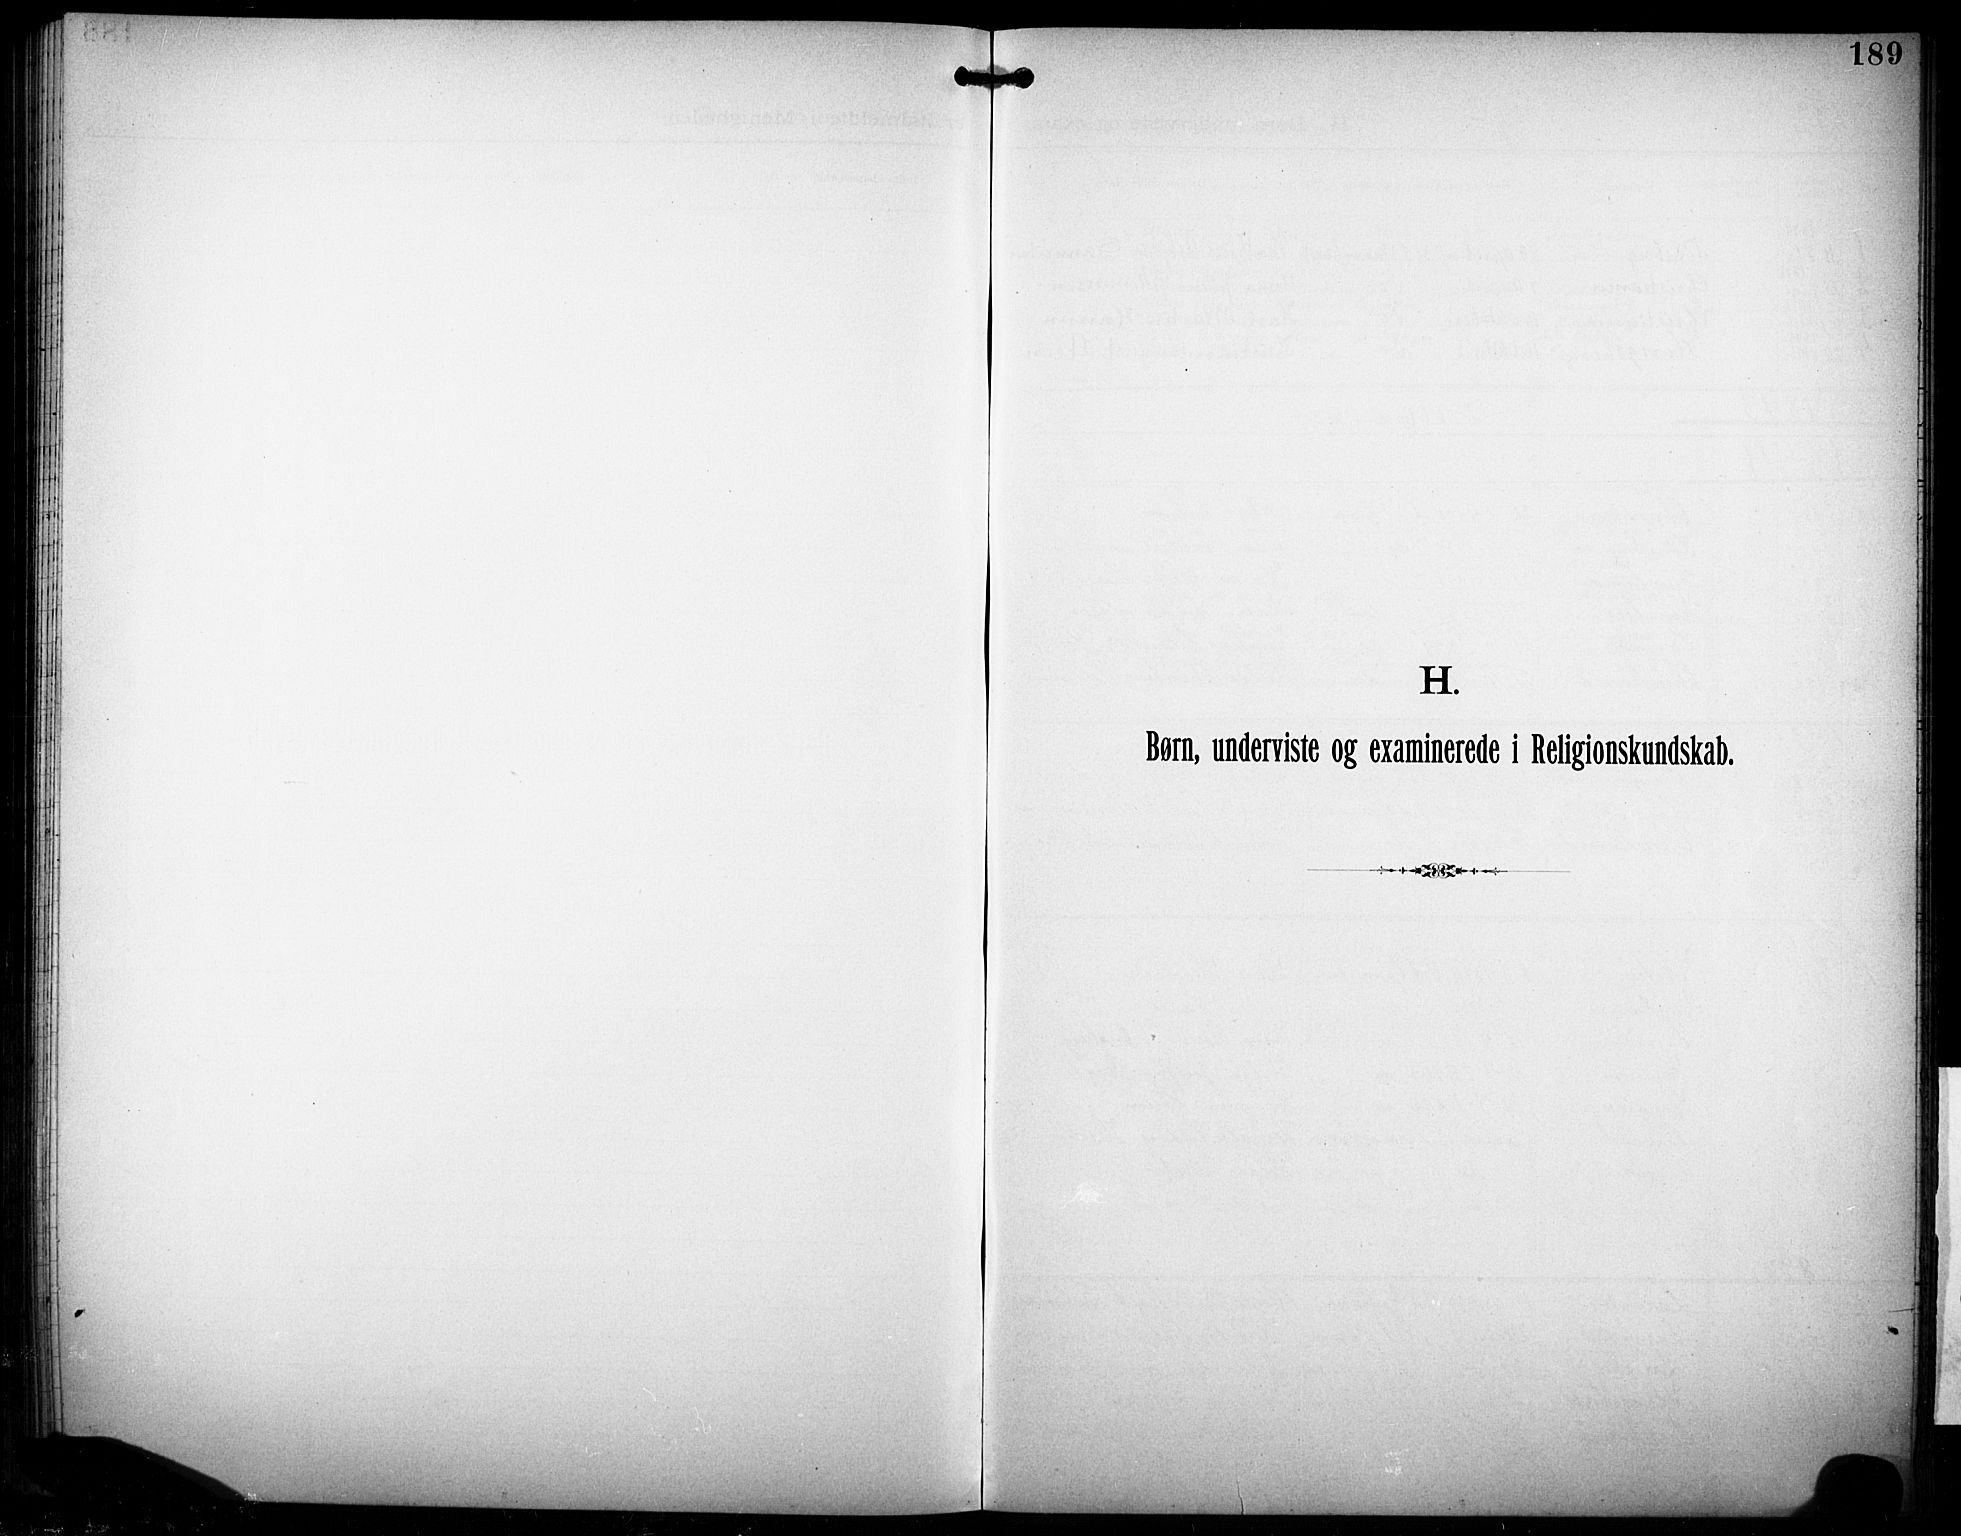 SAKO, Den katolsk-apostoliske menighet i Larvik, F/Fa/L0001: Dissenterprotokoll nr. 1, 1892-1933, s. 189